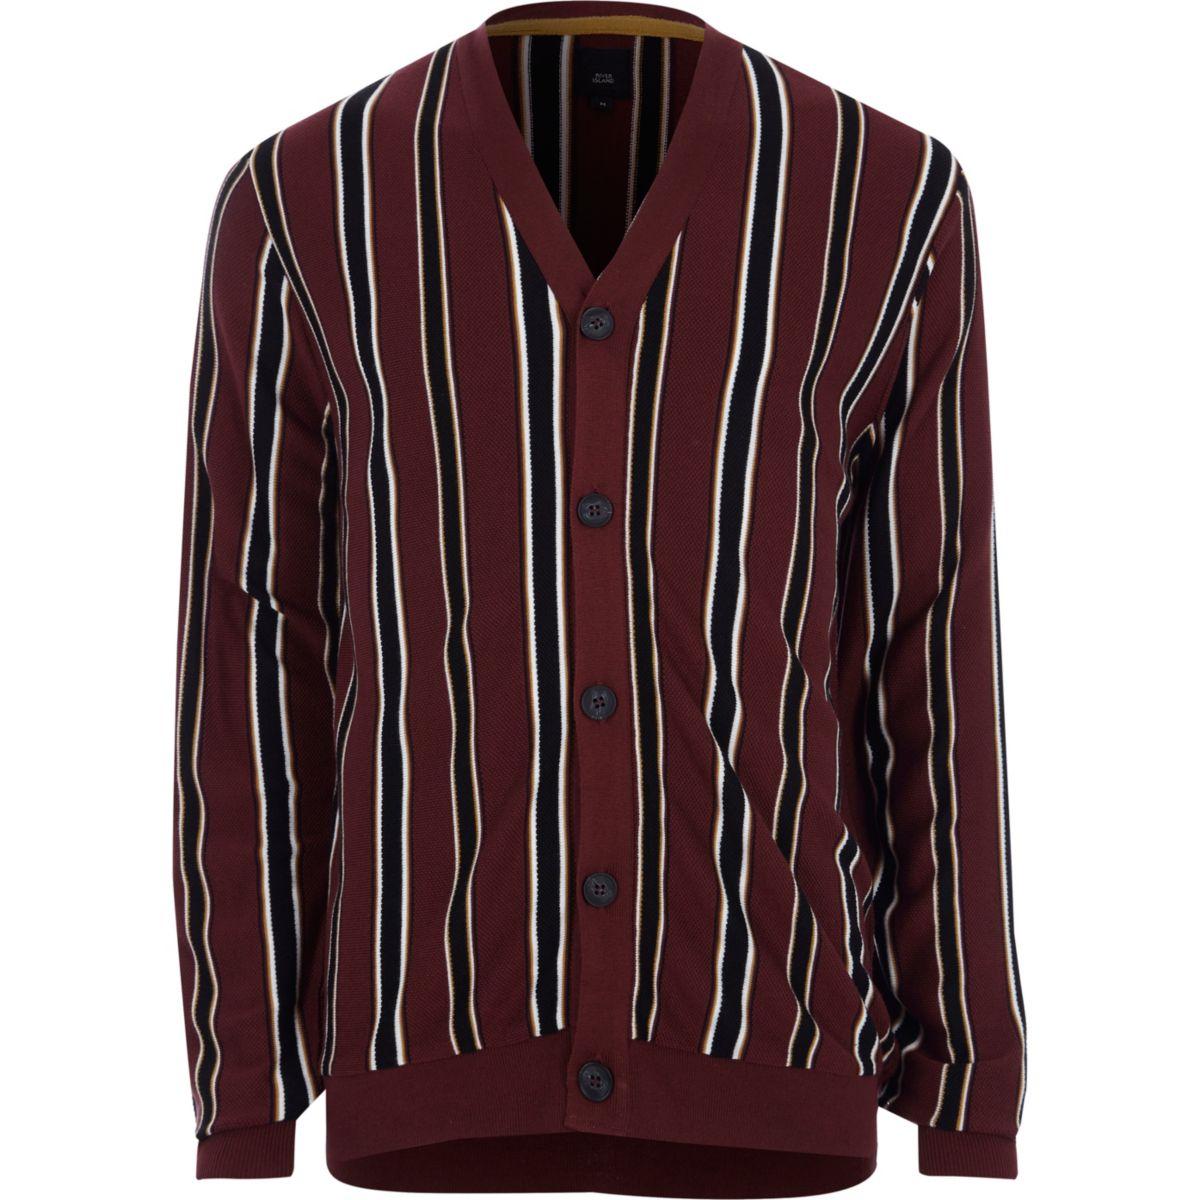 Burgundy stripe knit cardigan